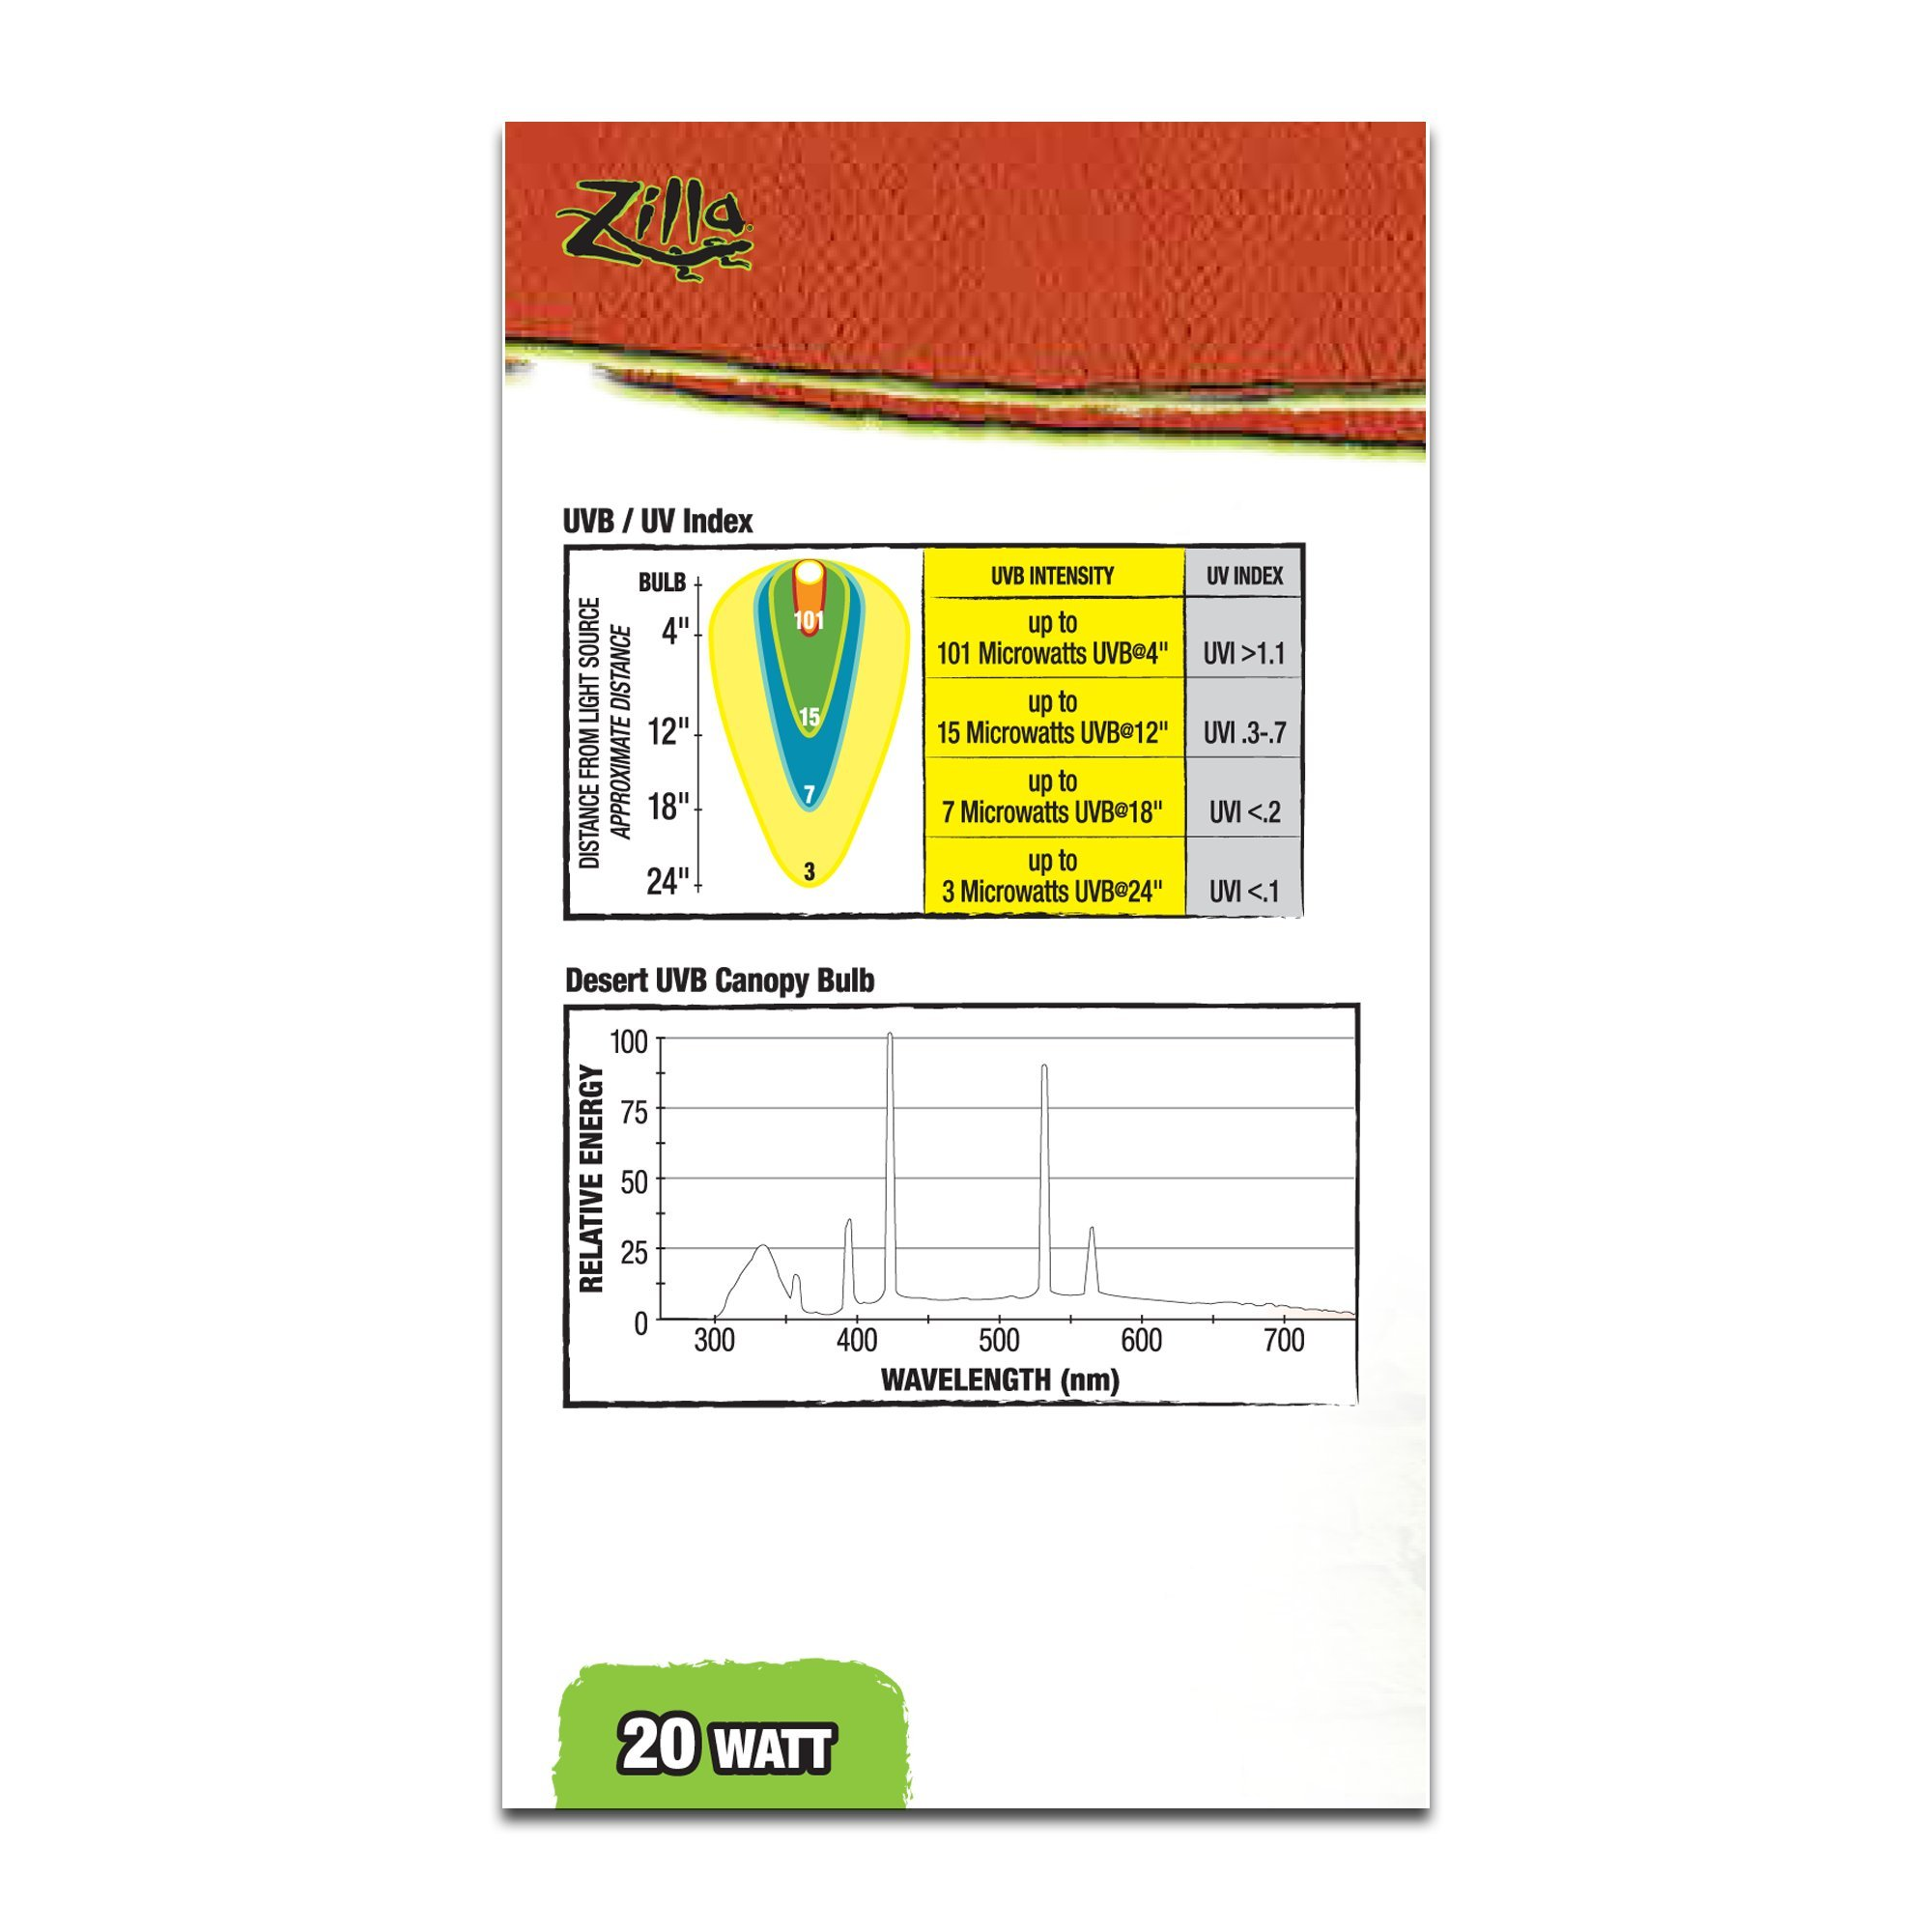 Zilla Desert Fluorescent UVB/UVA Bulb, 20 Watt, 3.875 IN by Zilla (Image #3)